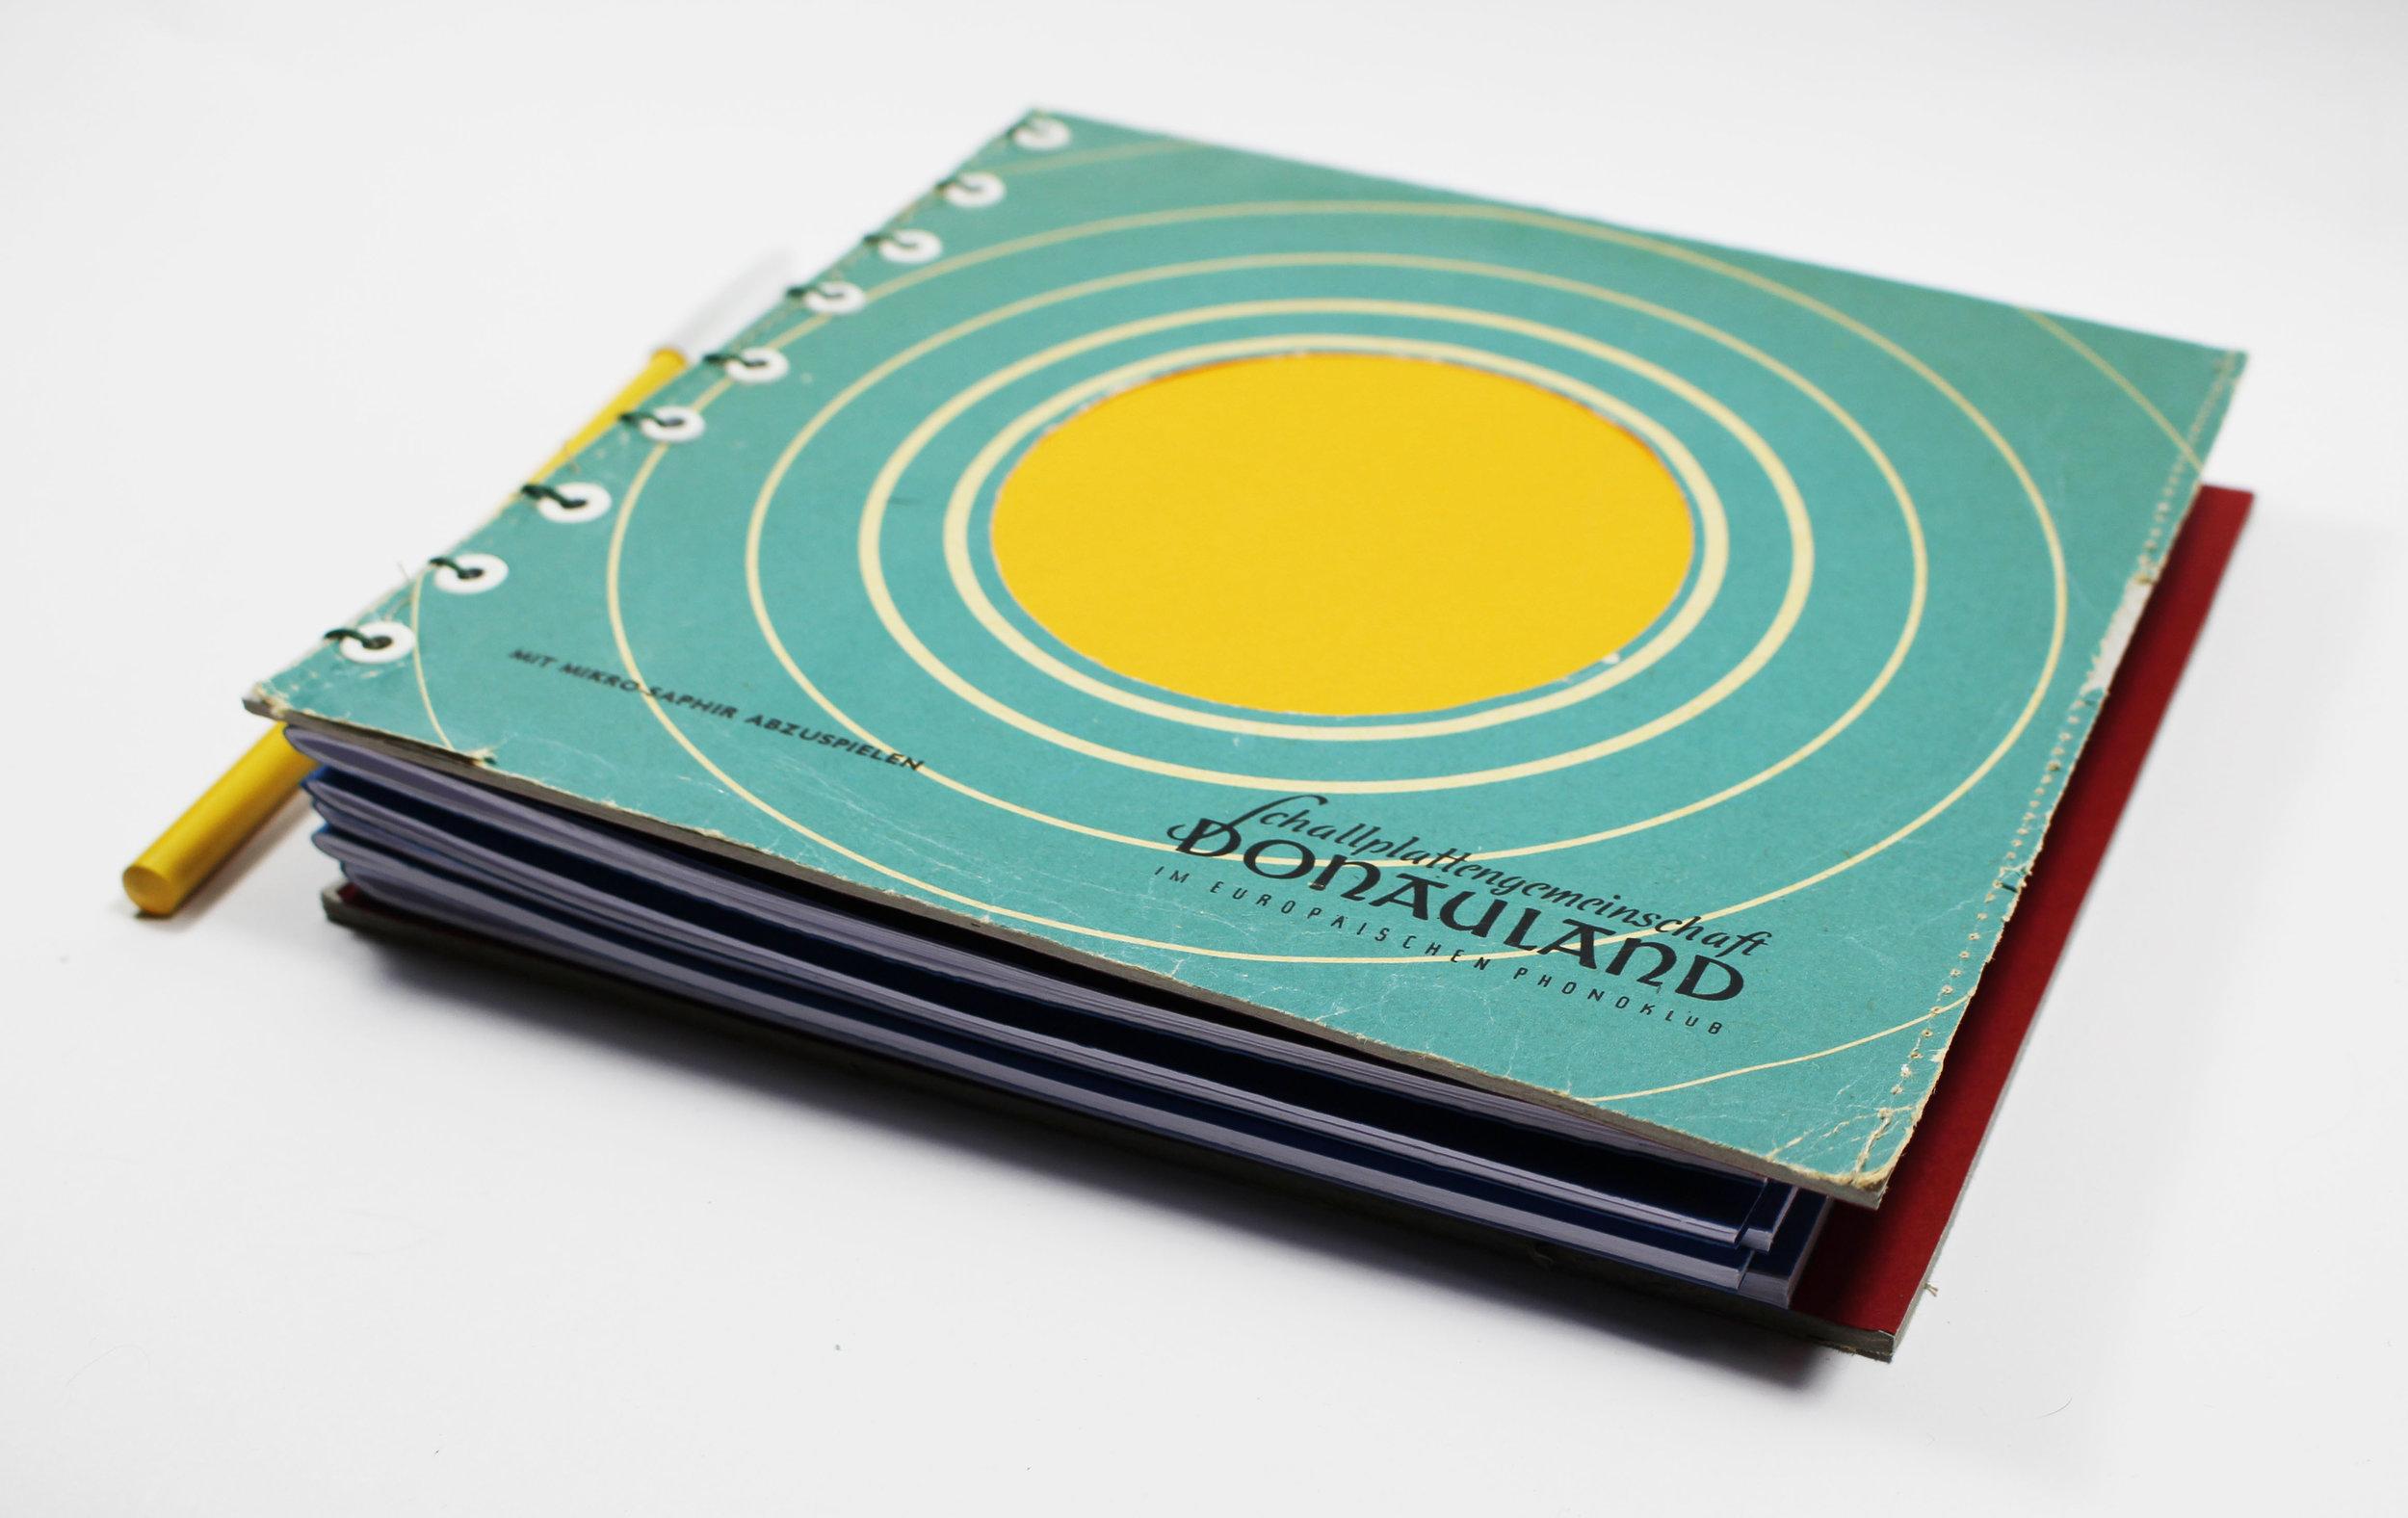 vintage-journal-vinly-Donauland_turquise_5.JPG